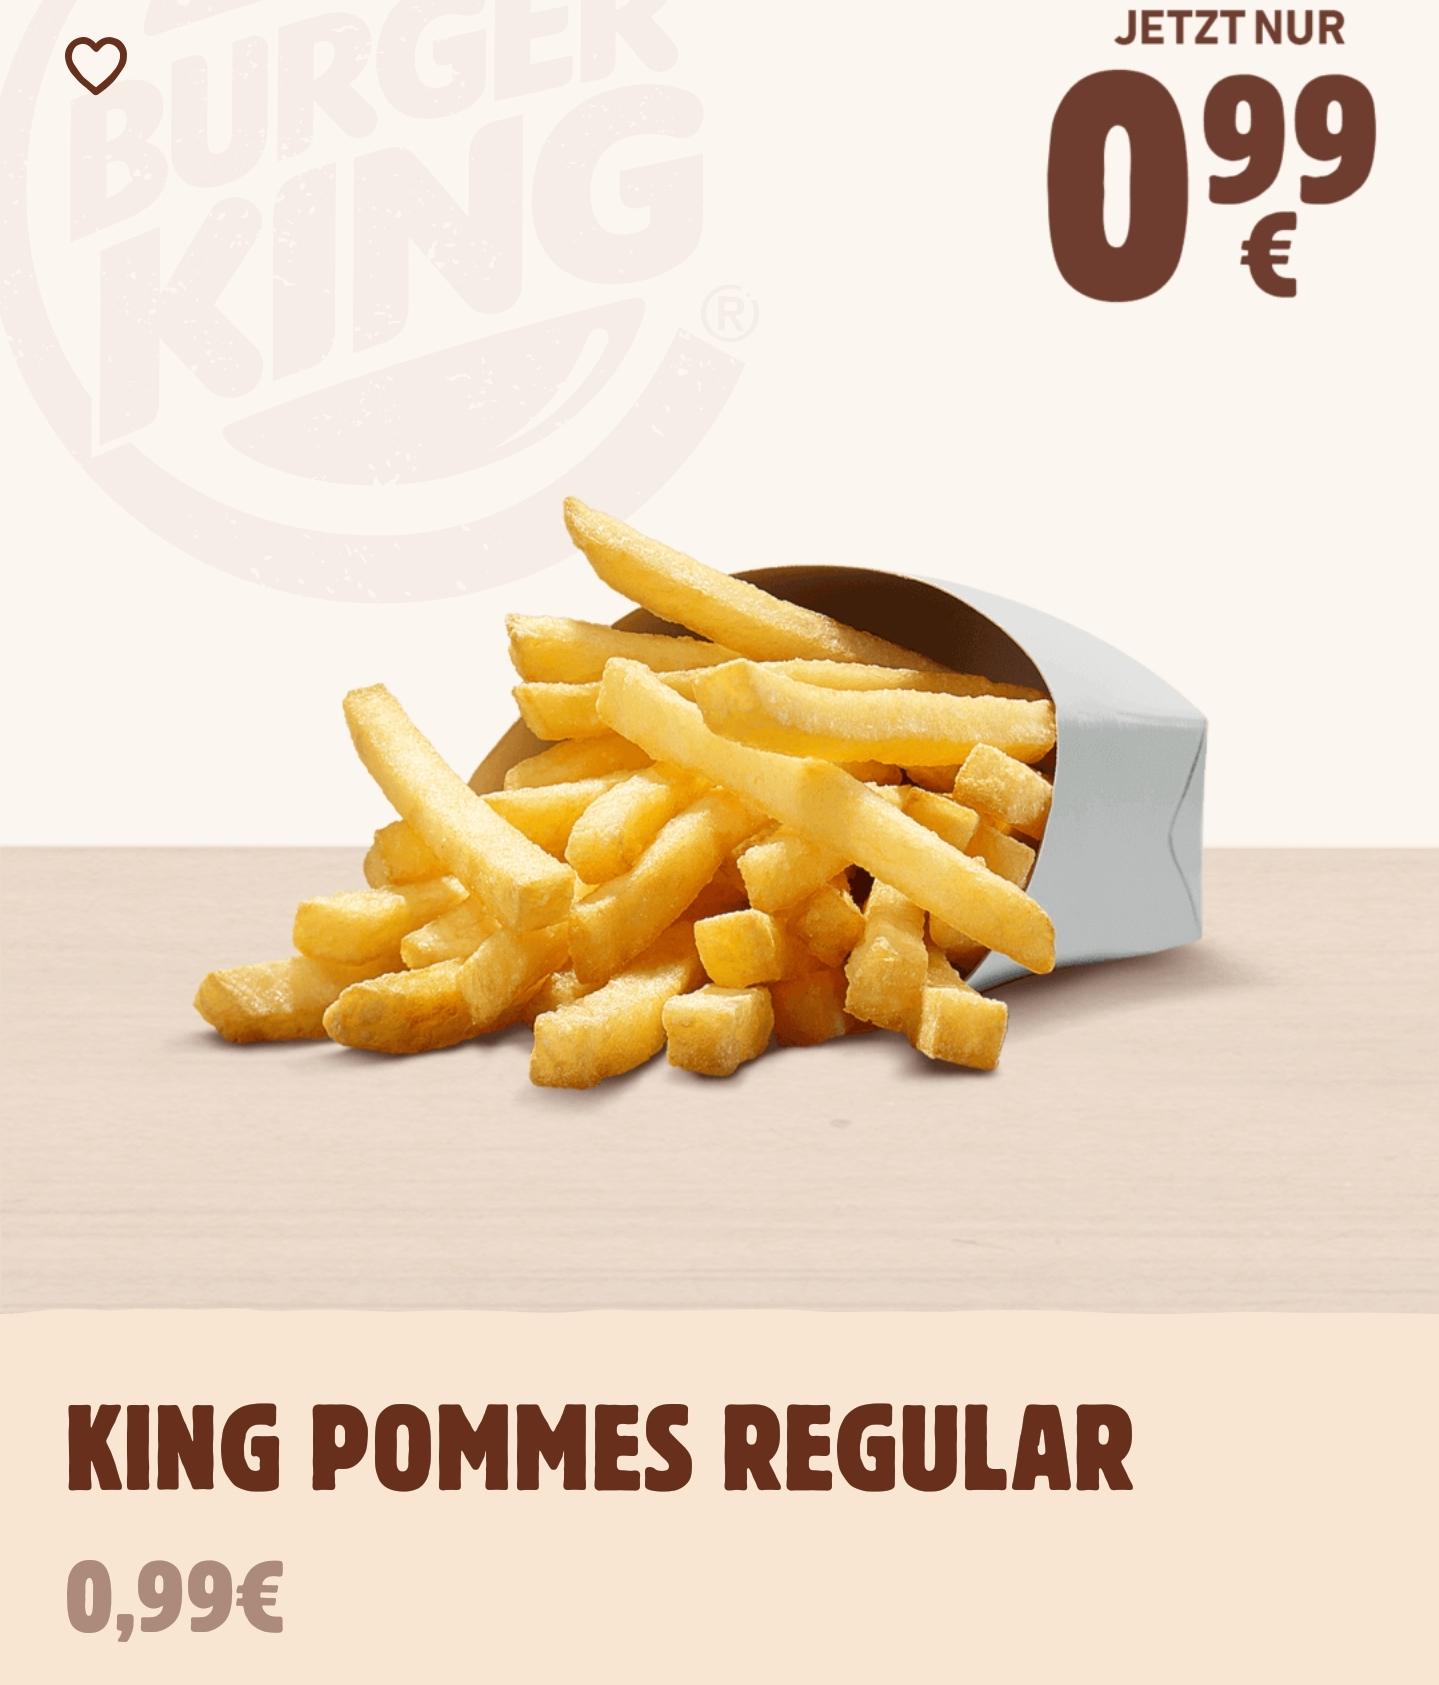 [Burger King] Pommes Regular (mittlere Portion) oder 6 Onion Rings für 0,99€